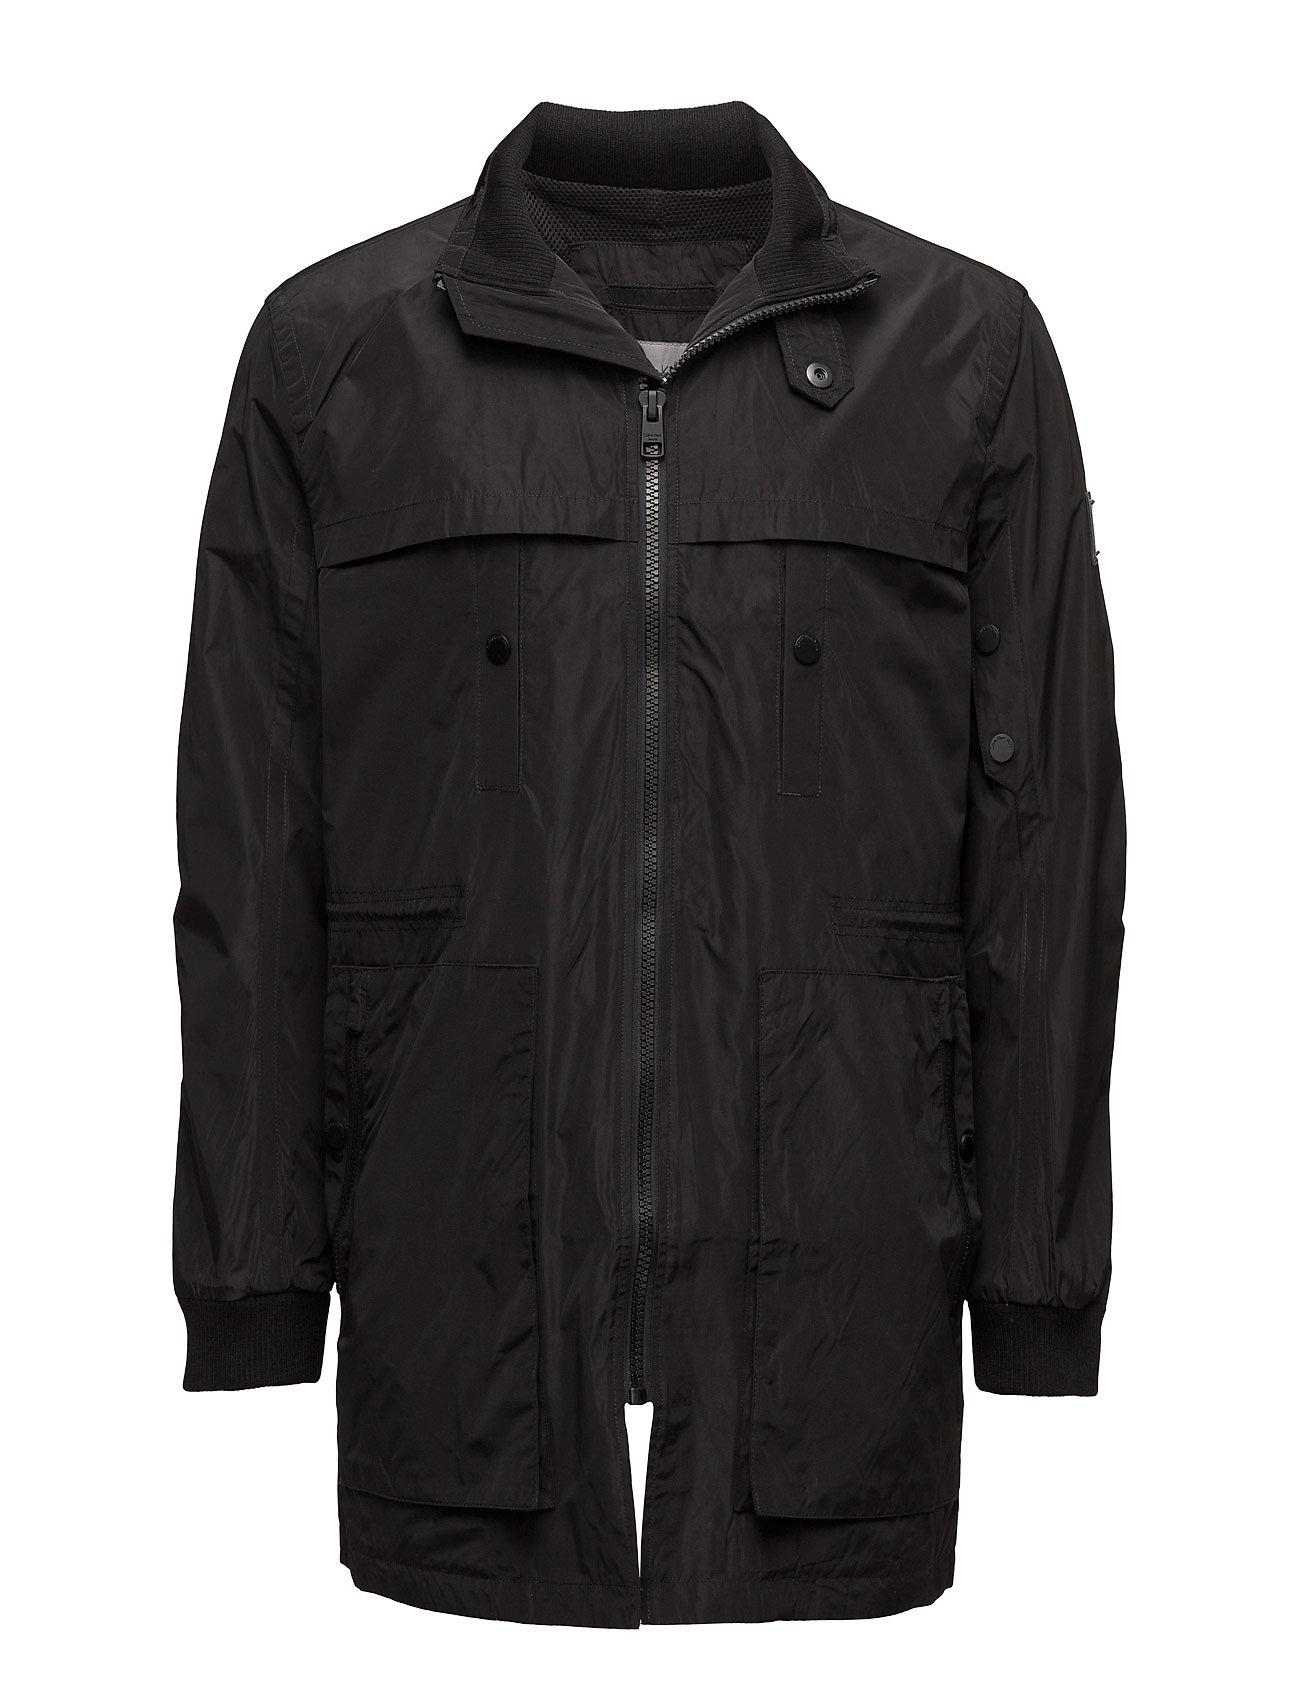 calvin klein jeans Octaar long jacket, på boozt.com dk